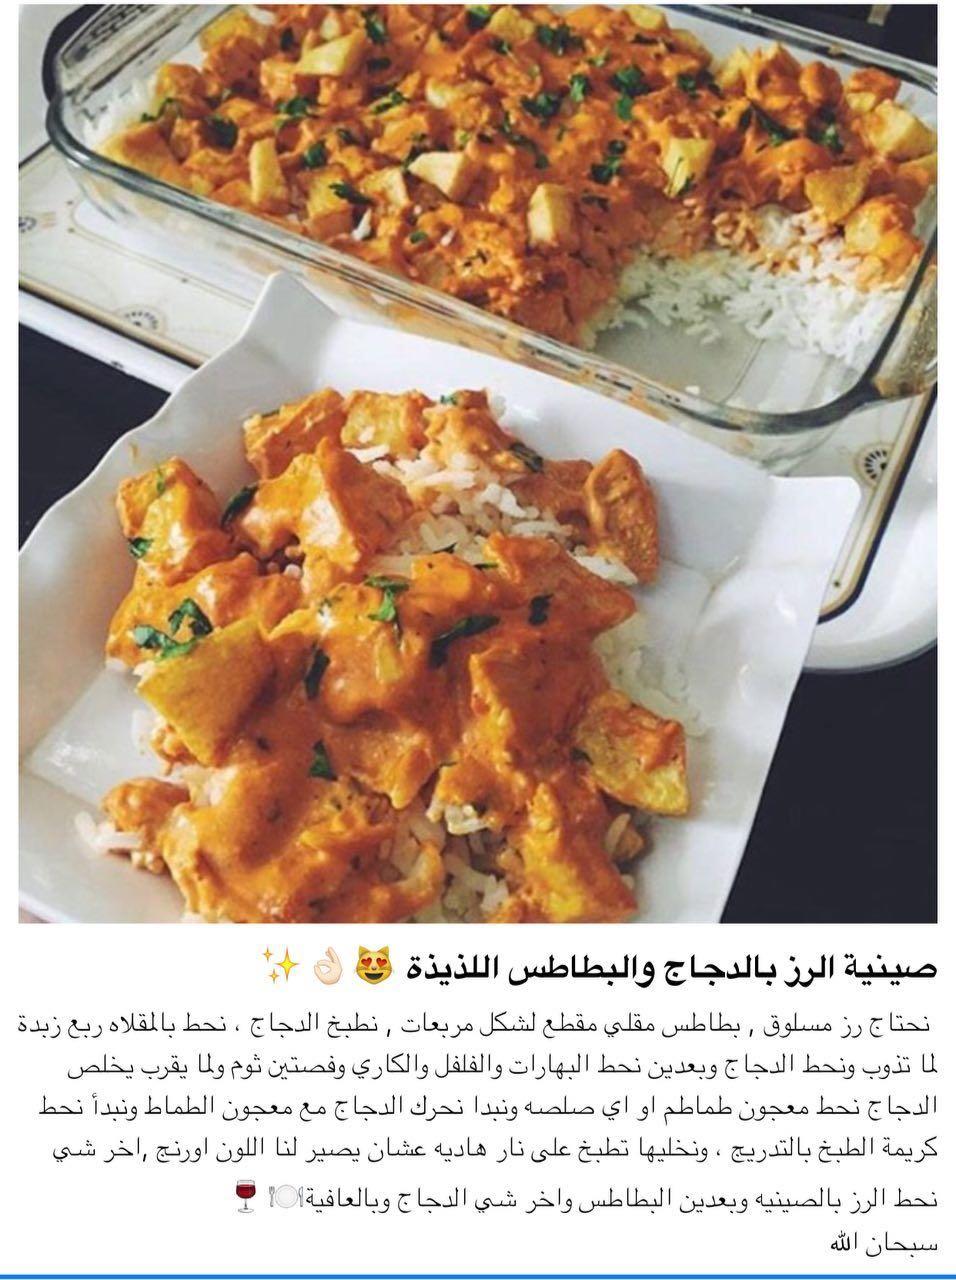 صينية دجاج بالبطاطس والأرز Cookout Food Egyptian Food Food Receipes